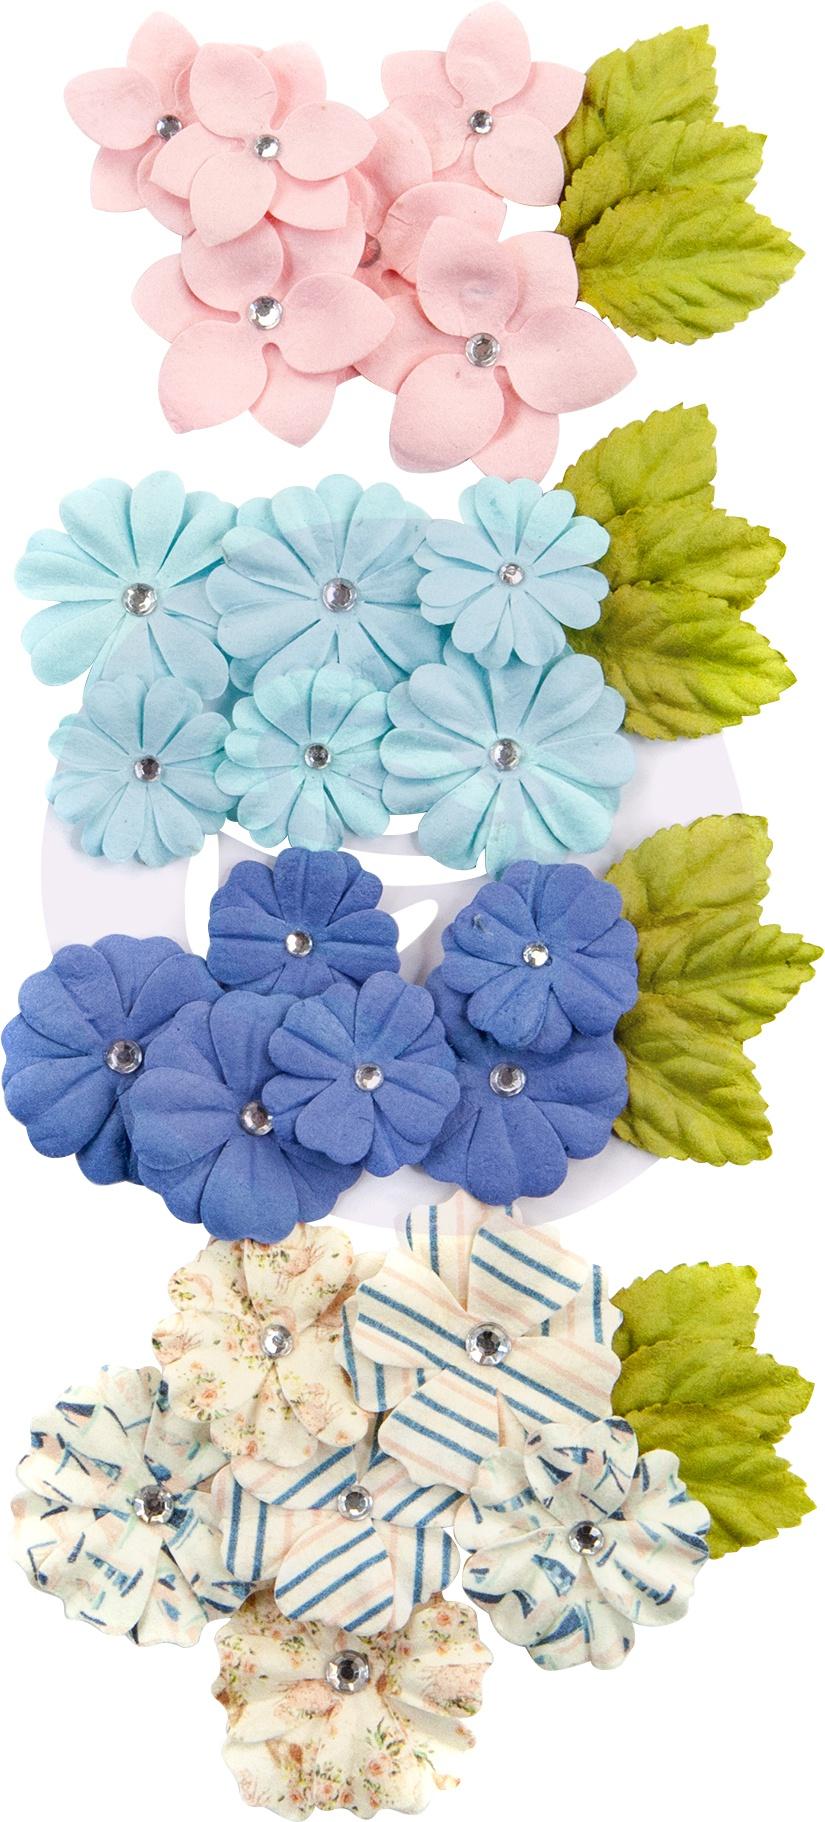 Prima - Mulberry Paper Flowers  - Del Mar/Golden Coast, 36/Pkg